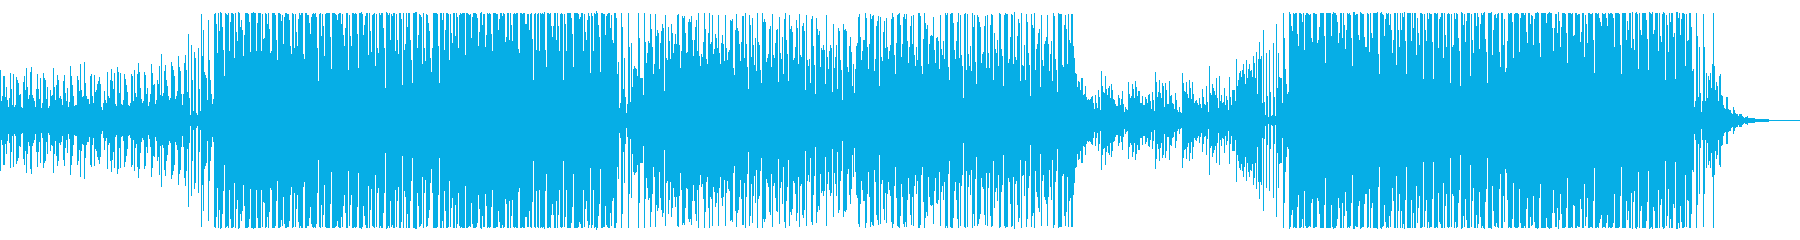 RunForTheFutureの再生済みの波形